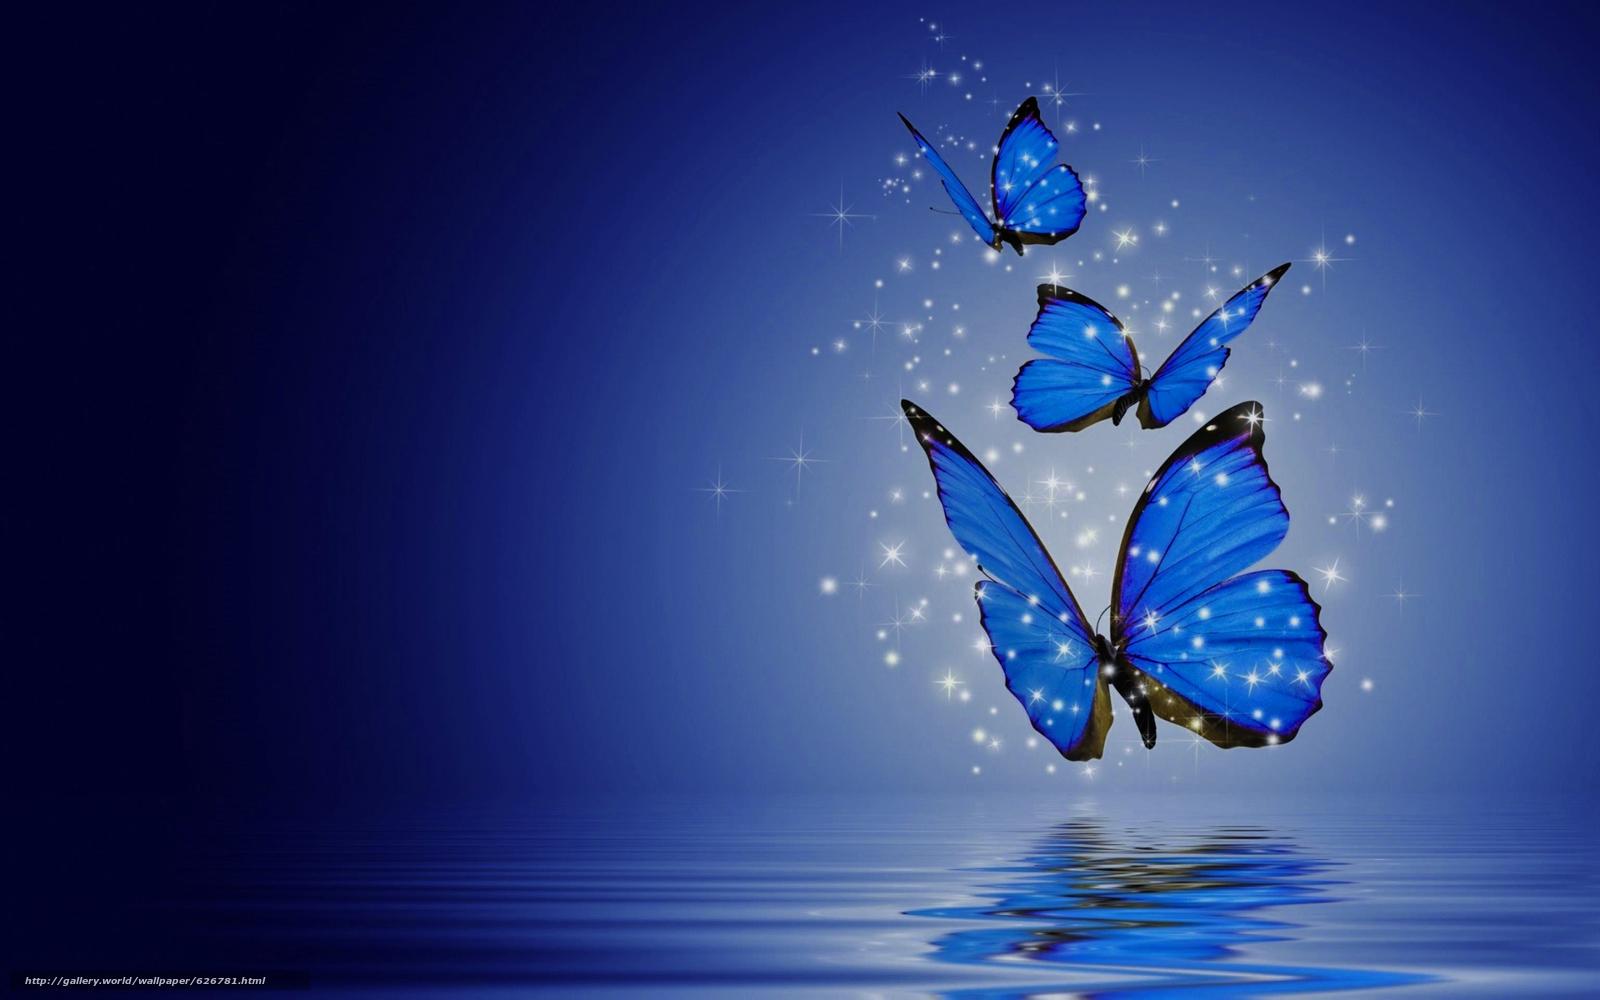 Scaricare gli sfondi farfalle farfalle 3d sfondi gratis for Sfondi per desktop 3d